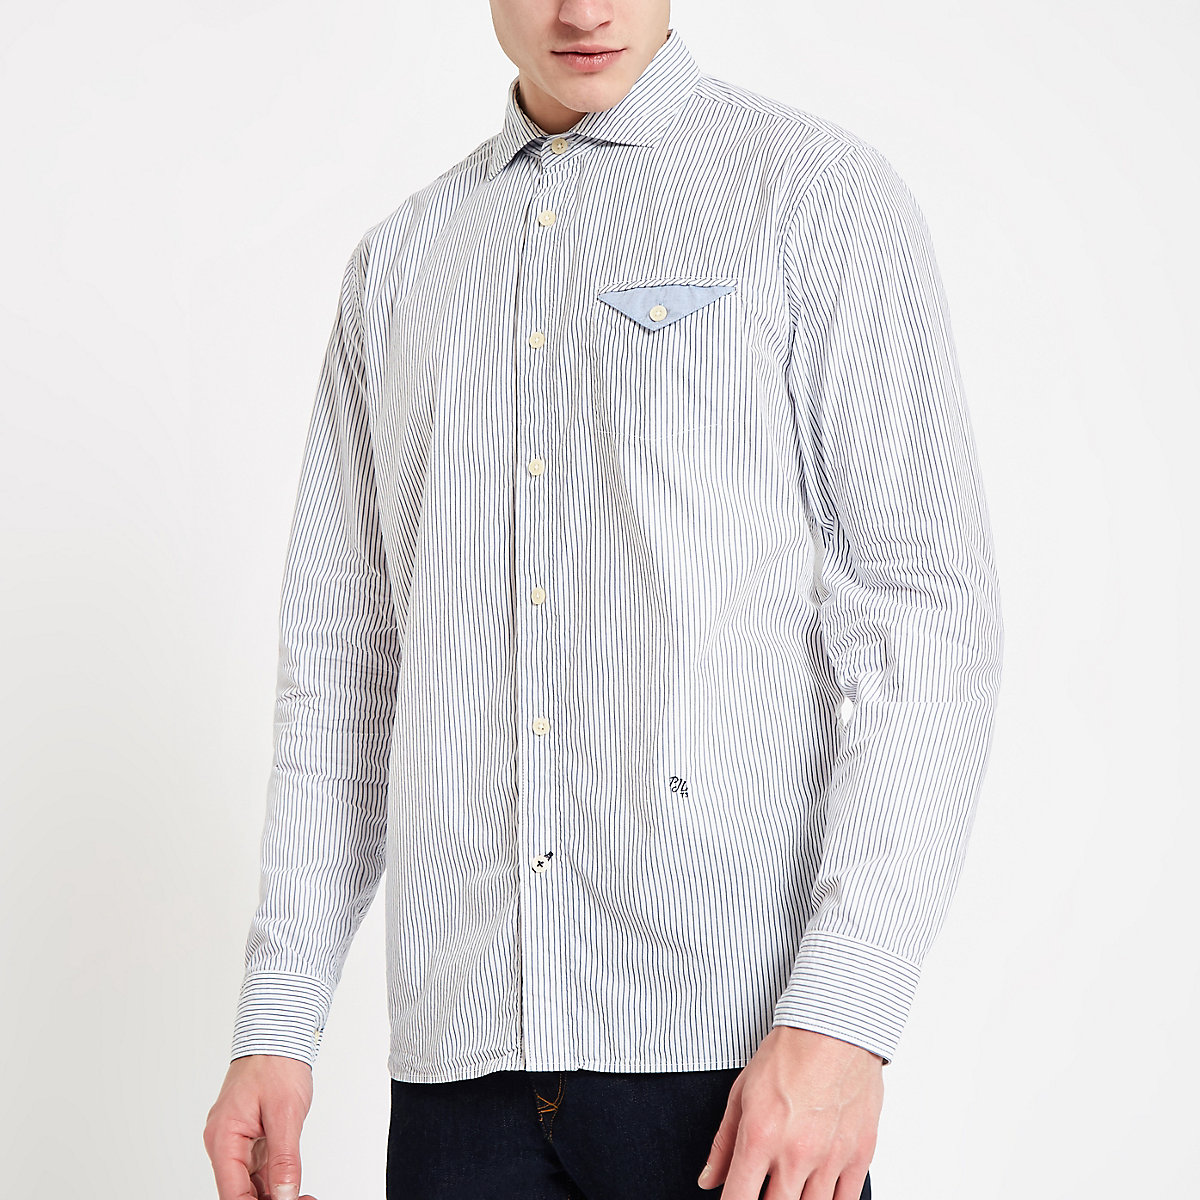 Pepe Jeans blue fine stripe shirt